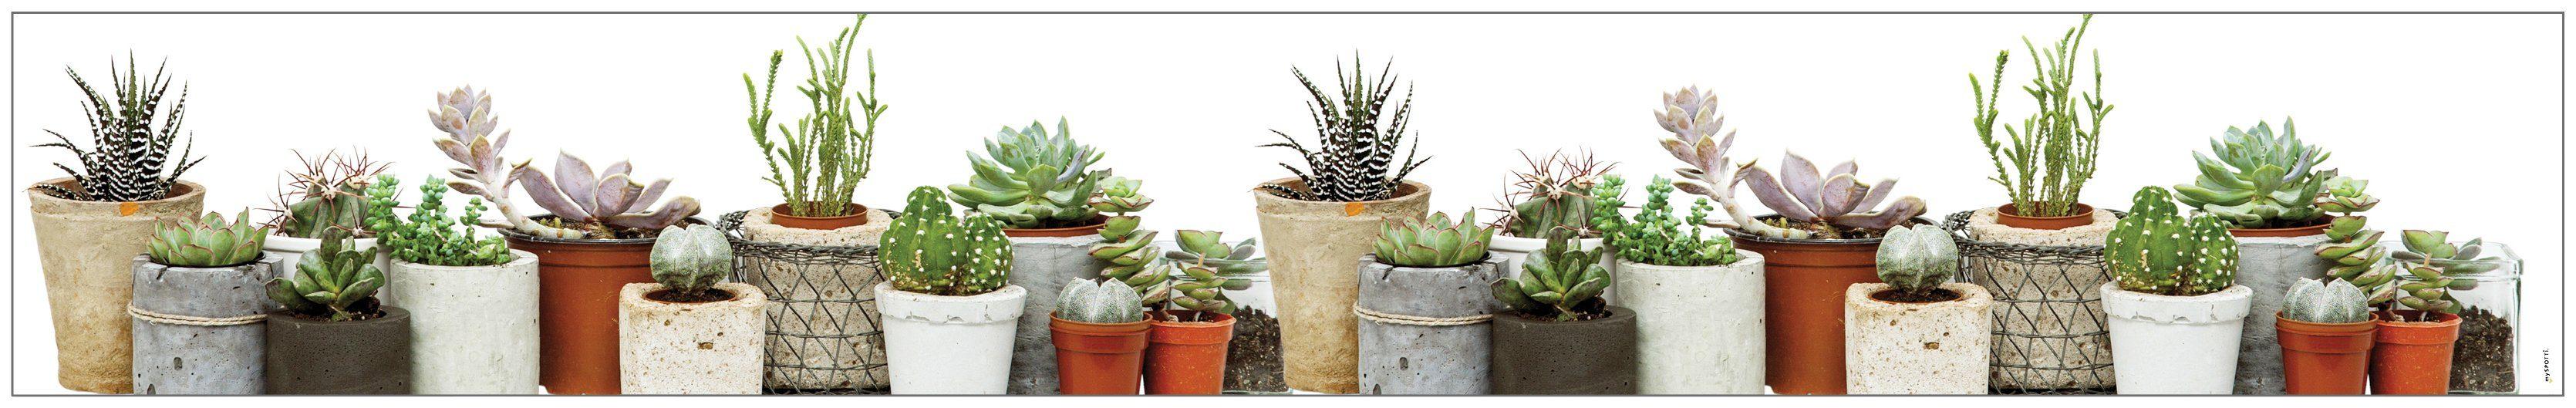 MYSPOTTI Fensterfolie »mySPOTTI look Succulents«, 200 x 30 cm, statisch haftend